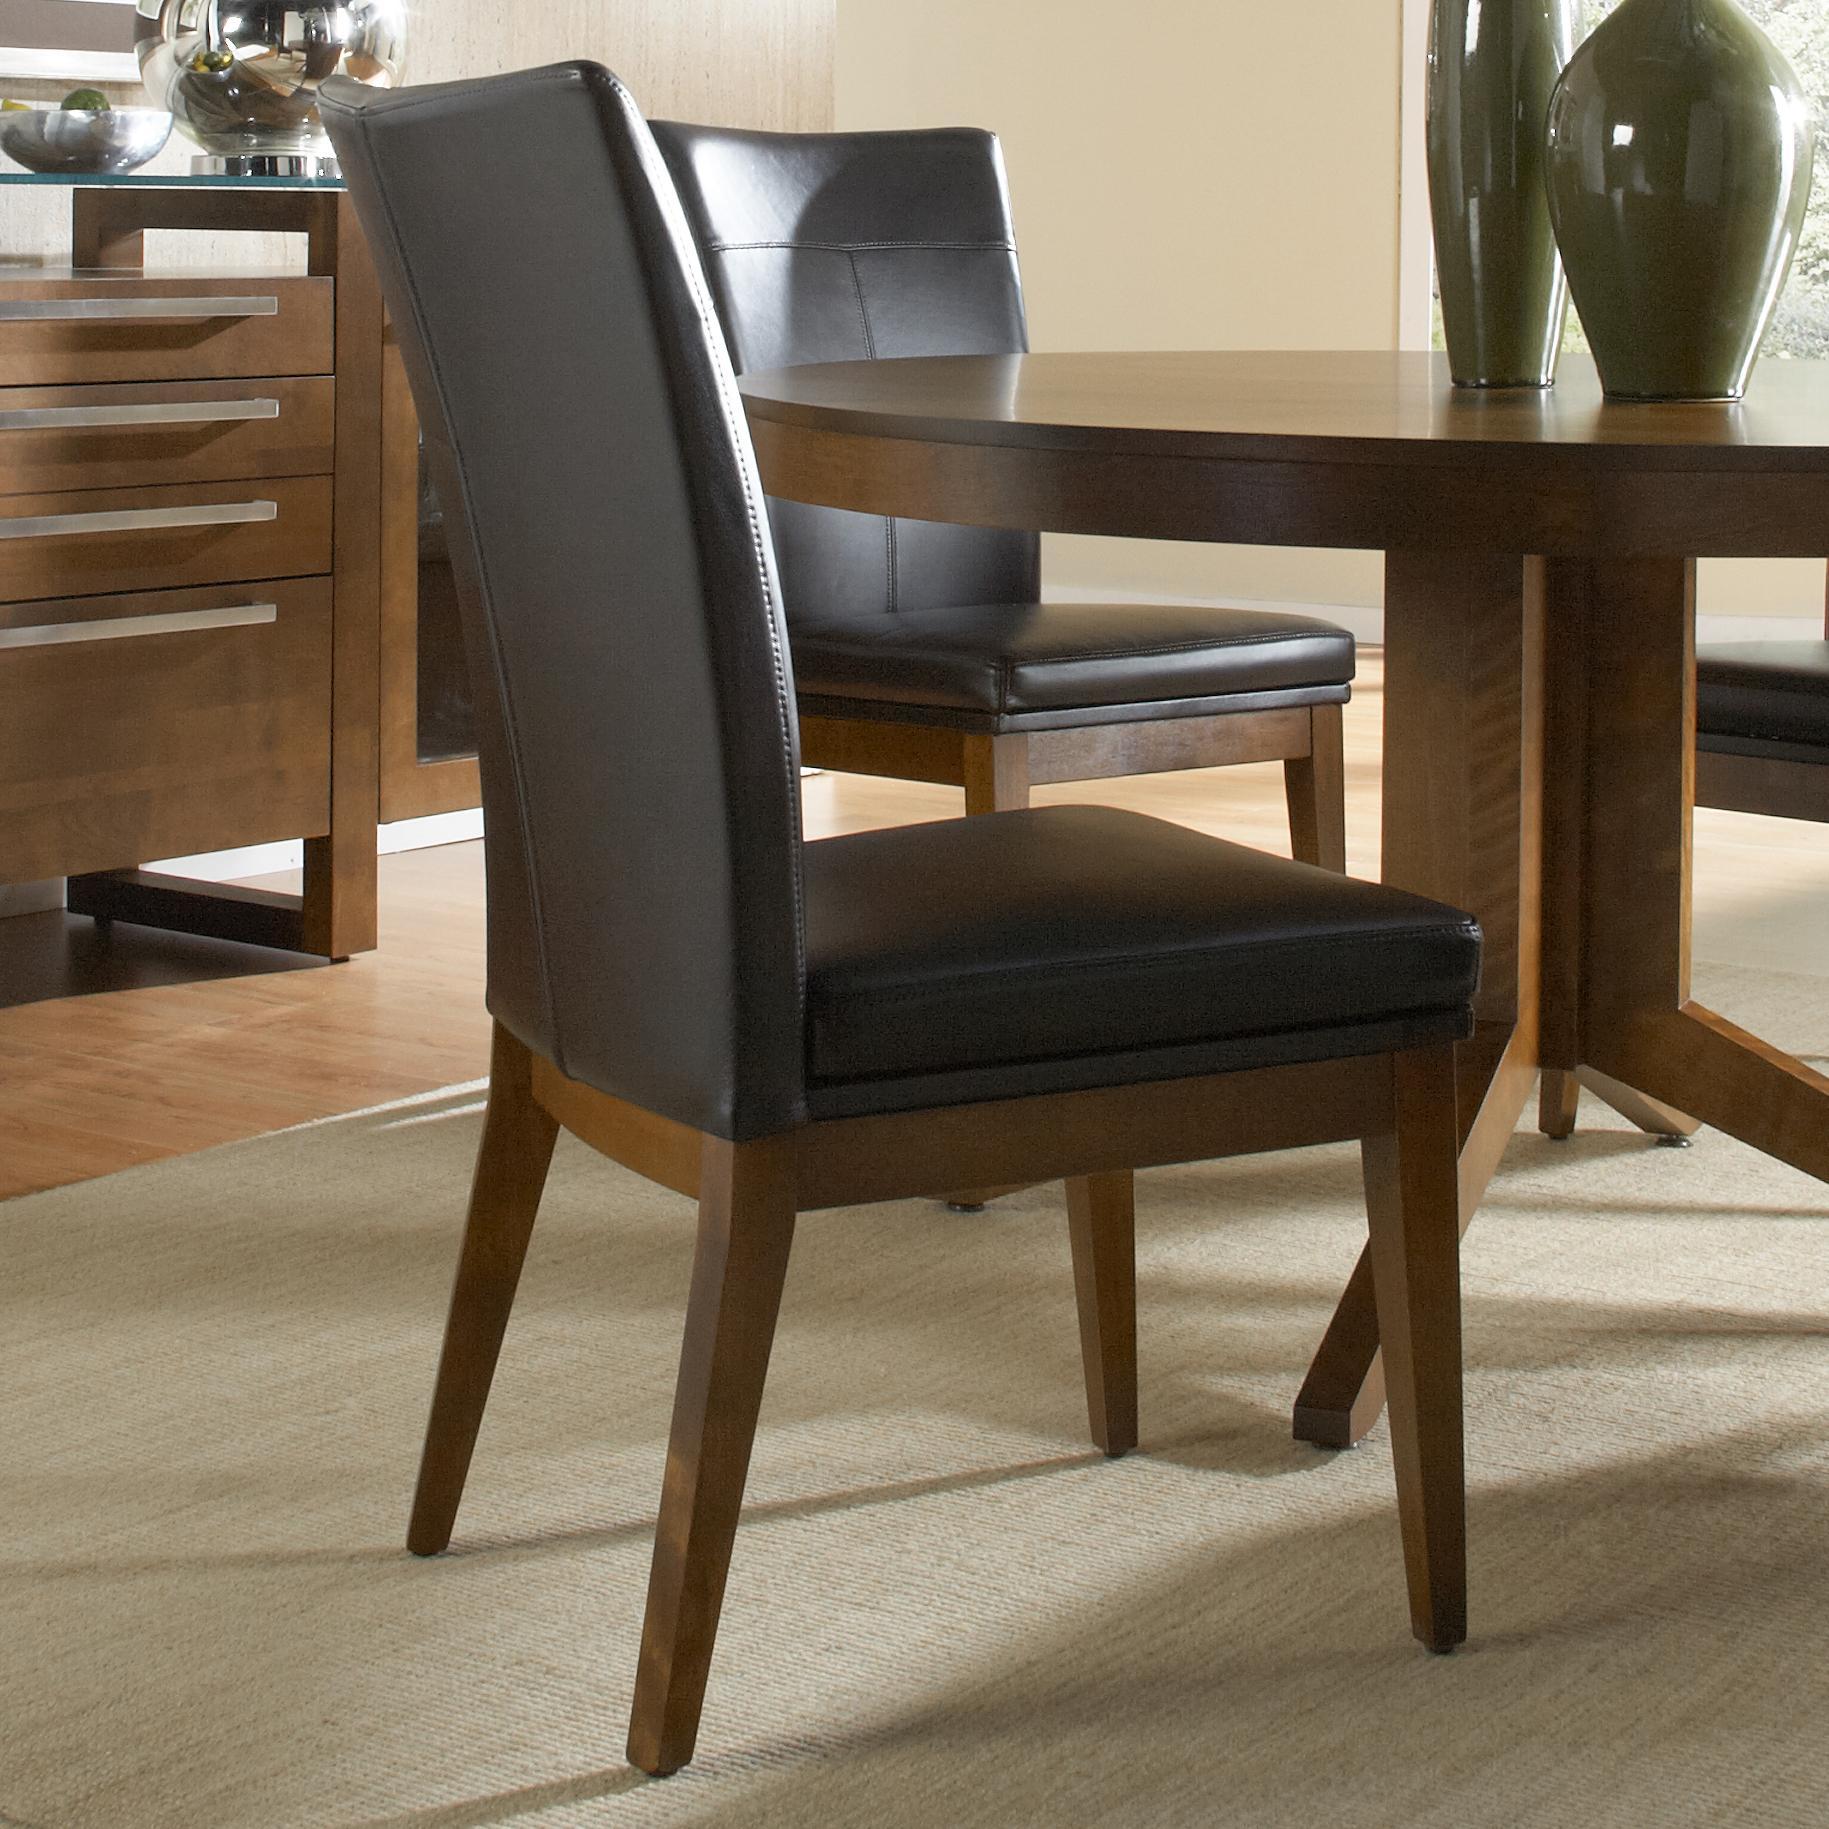 Custom Upholstered Side Chair: Canadel Custom Dining CNN05014ZC14MNA Customizable